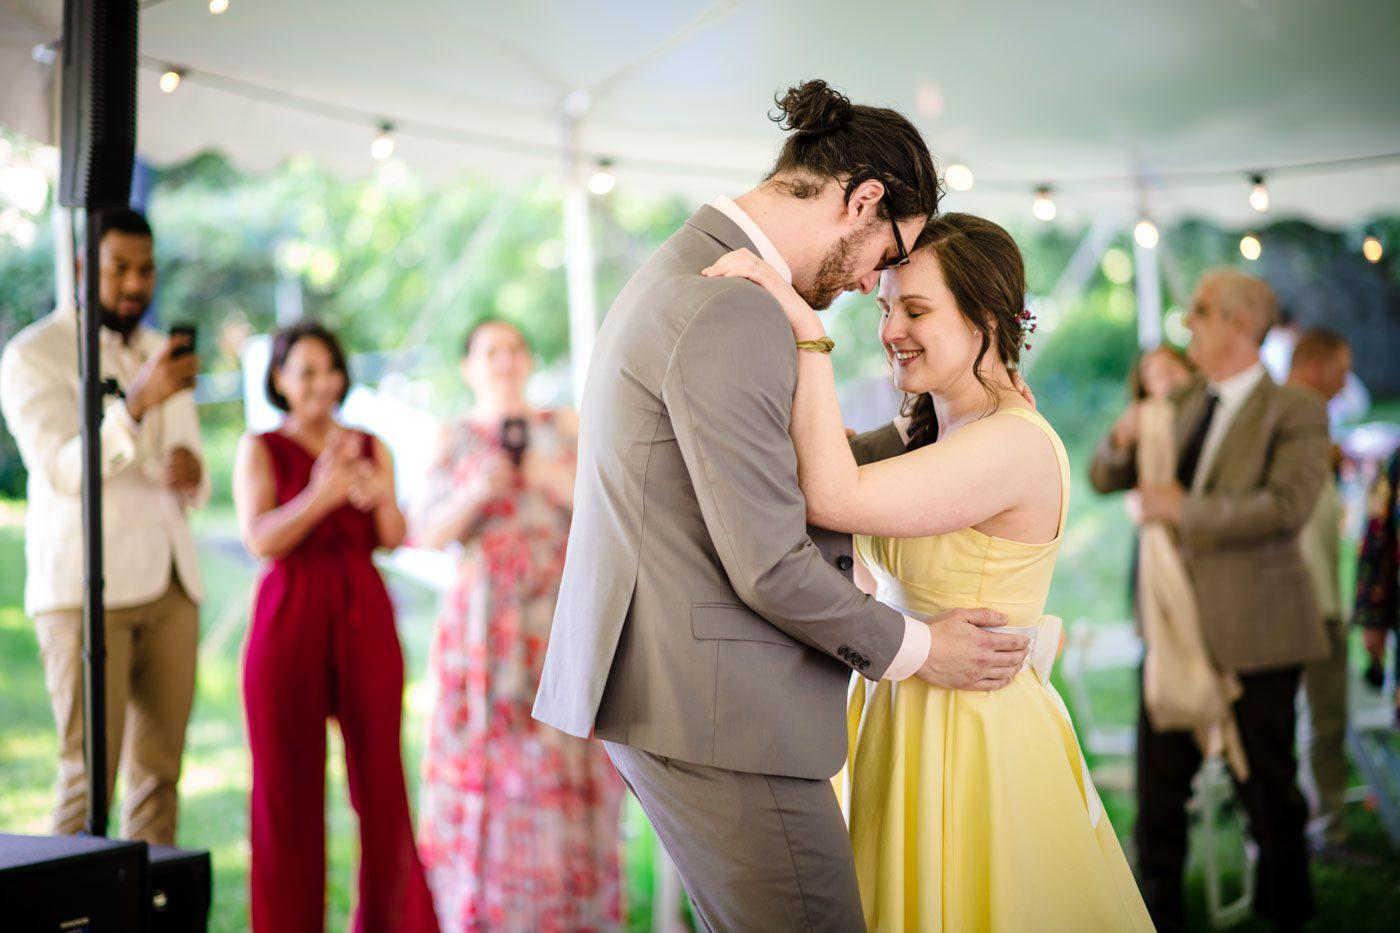 newlyweds-first-dance-under-tent